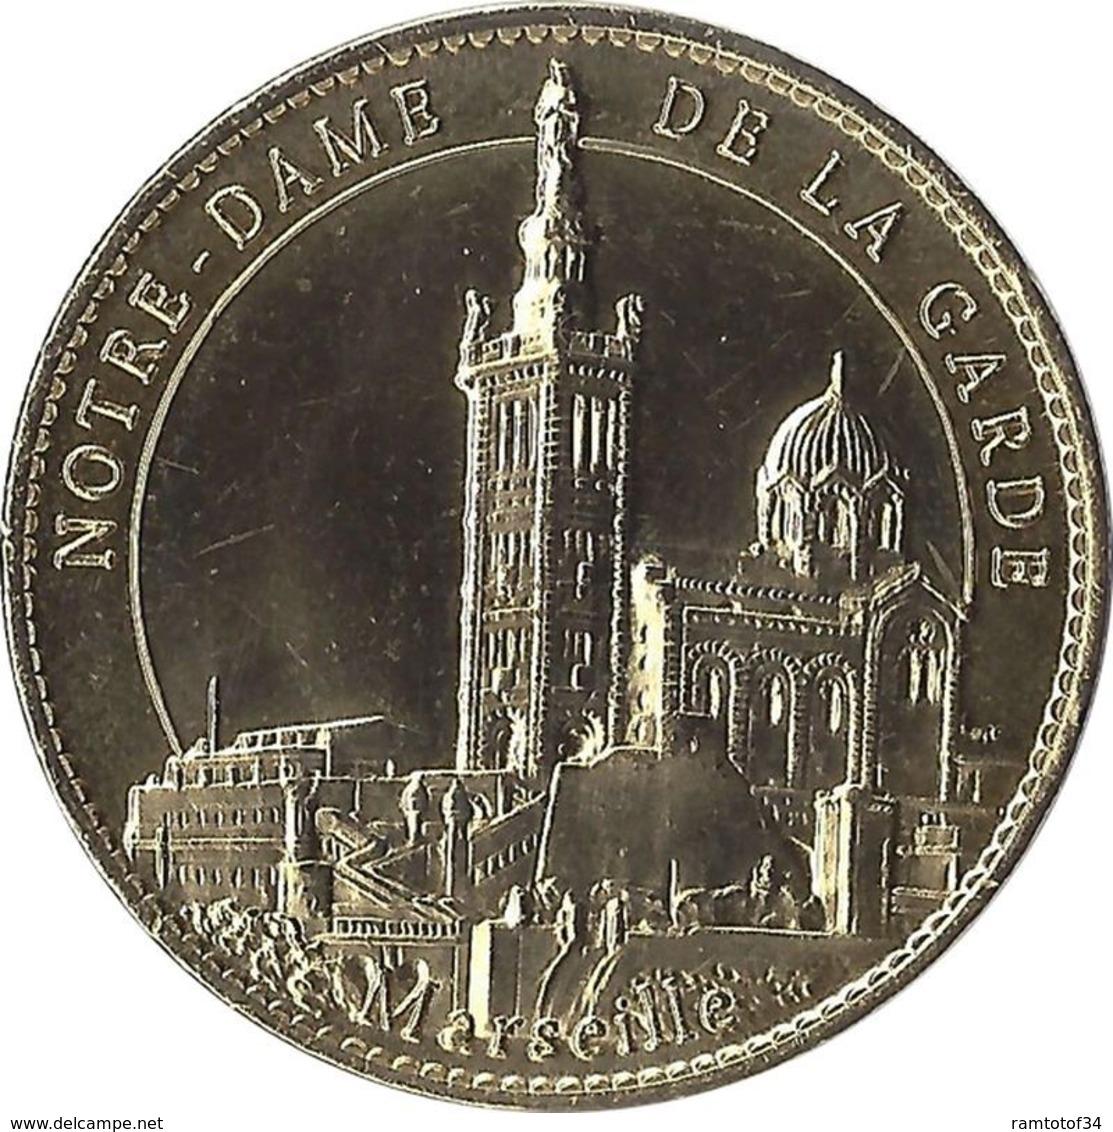 2015 AB112 - MARSEILLE - Notre Dame De La Garde 1 (la Galère) / ARTHUS BERTRAND - Arthus Bertrand